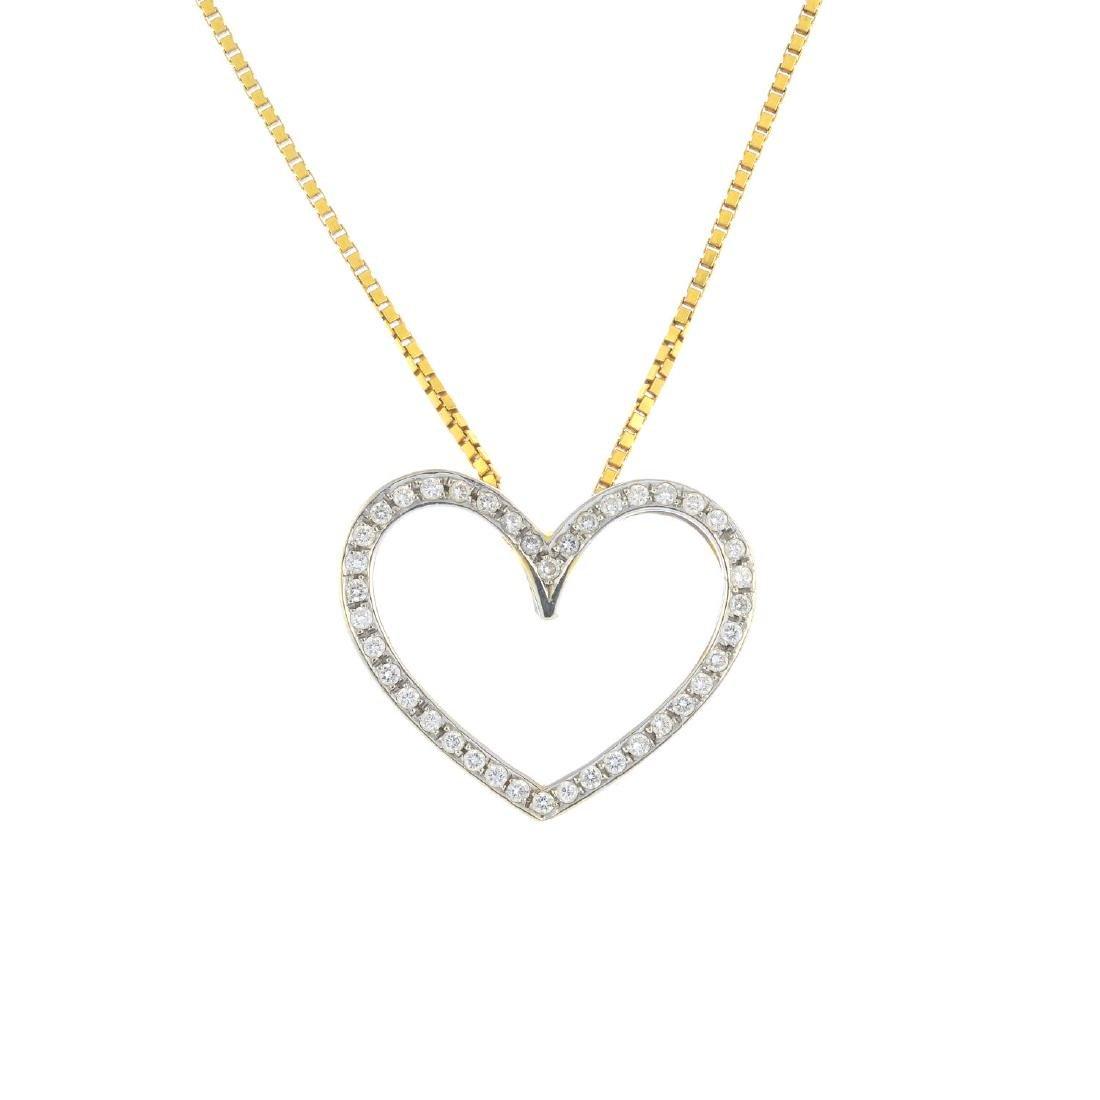 A diamond pendant. The brilliant-cut diamond openwork